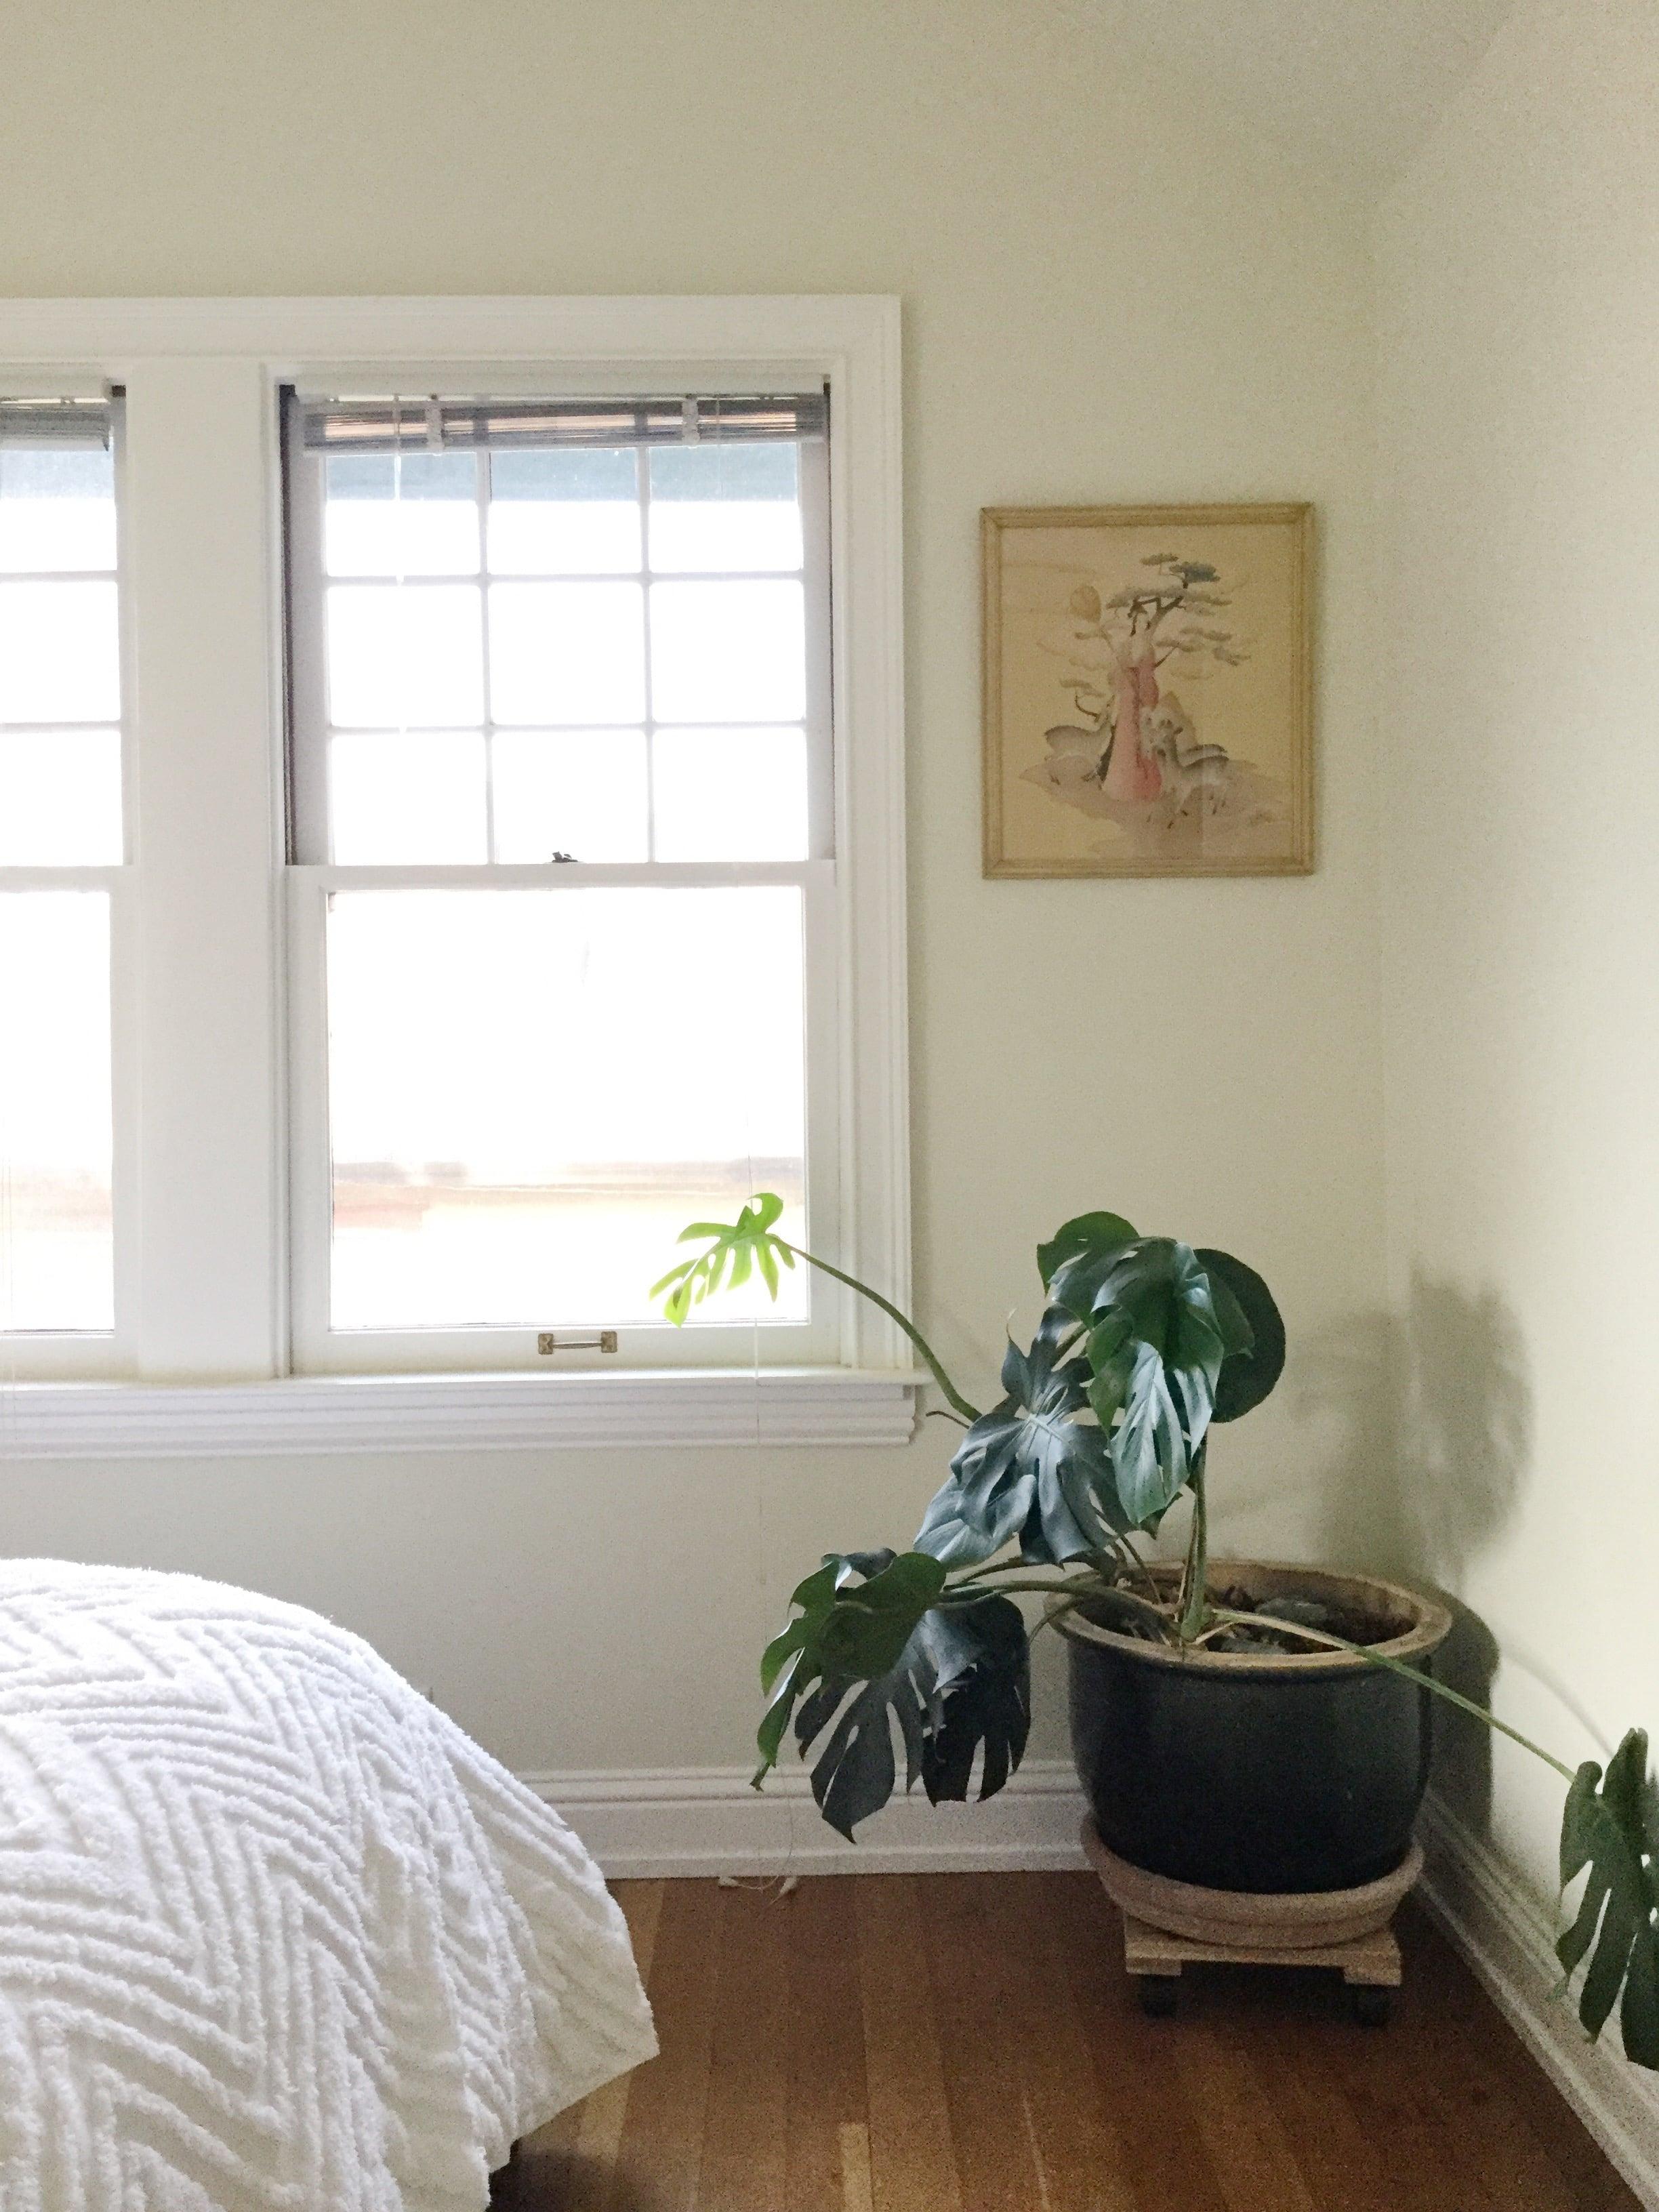 Zen details: a sleepy plant and soft light.